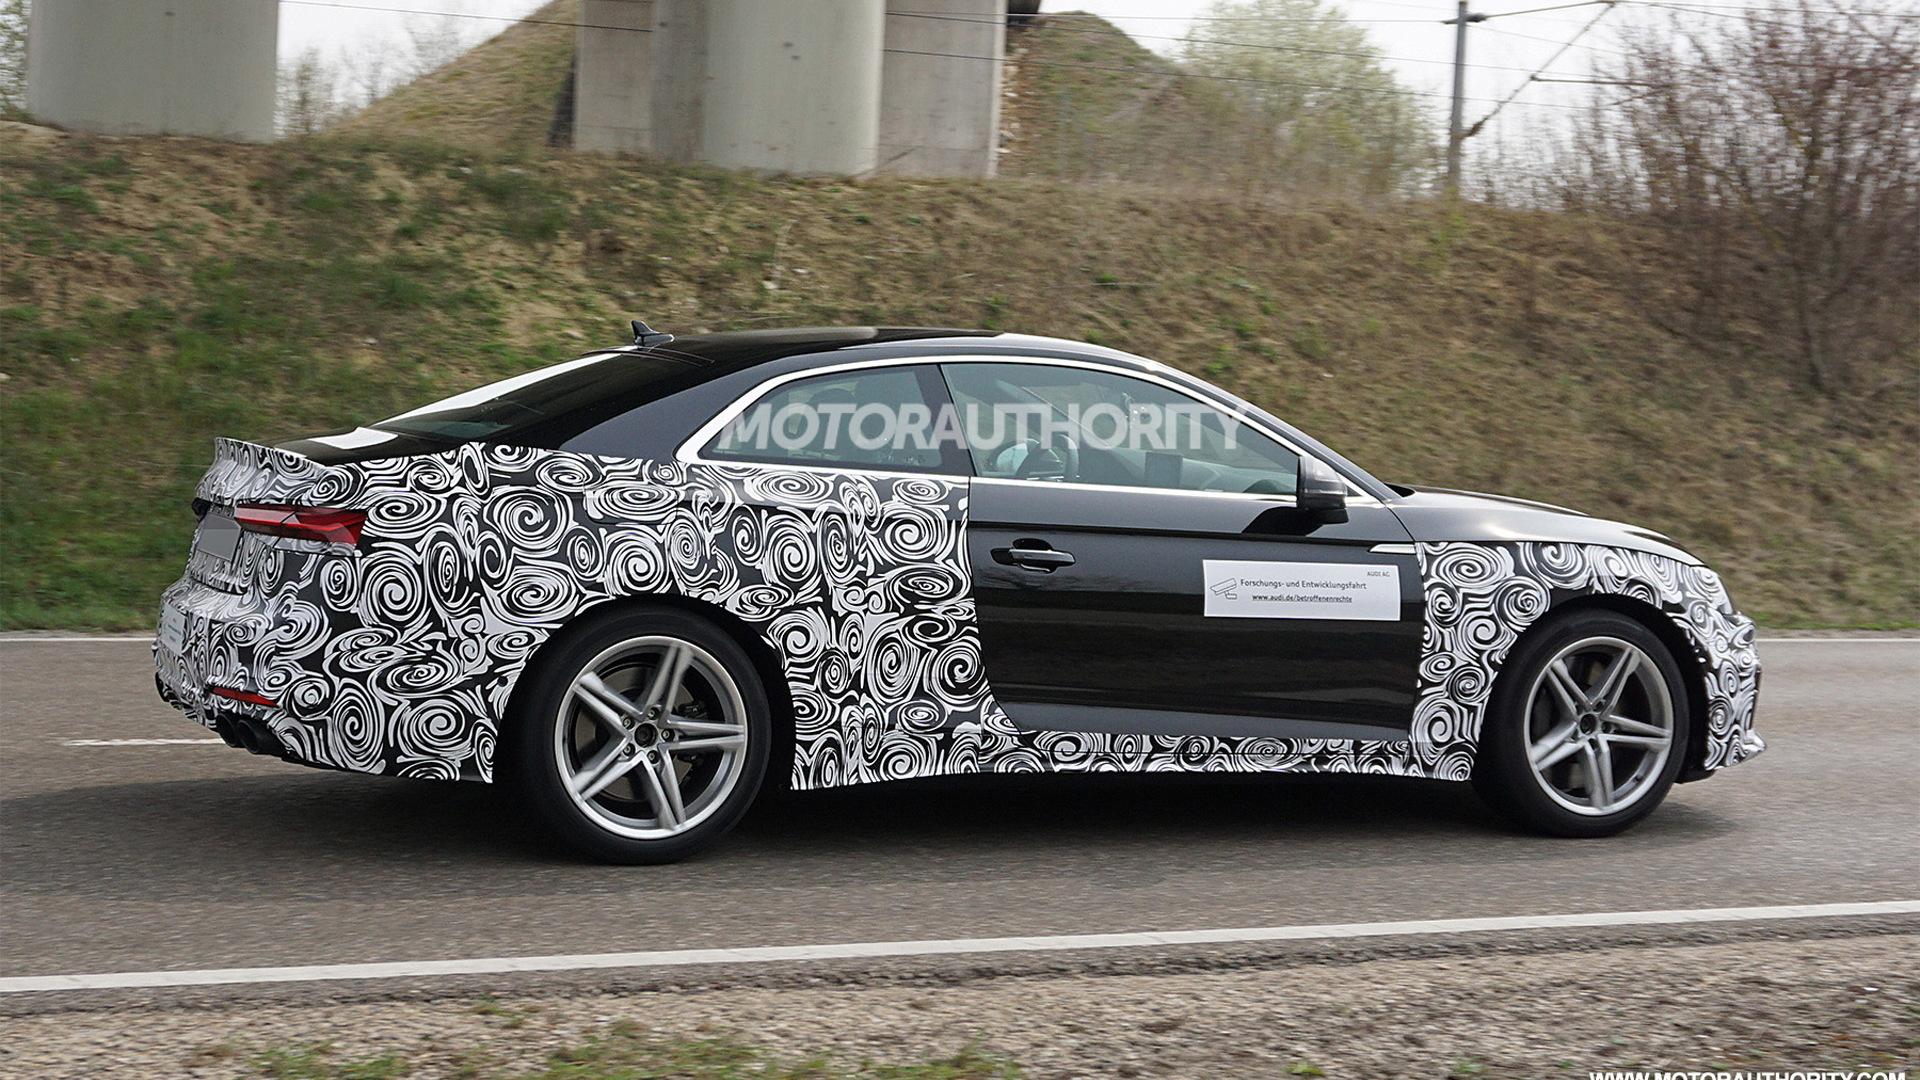 2021 Audi S5 facelift spy shots - Image via S. Baldauf/SB-Medien